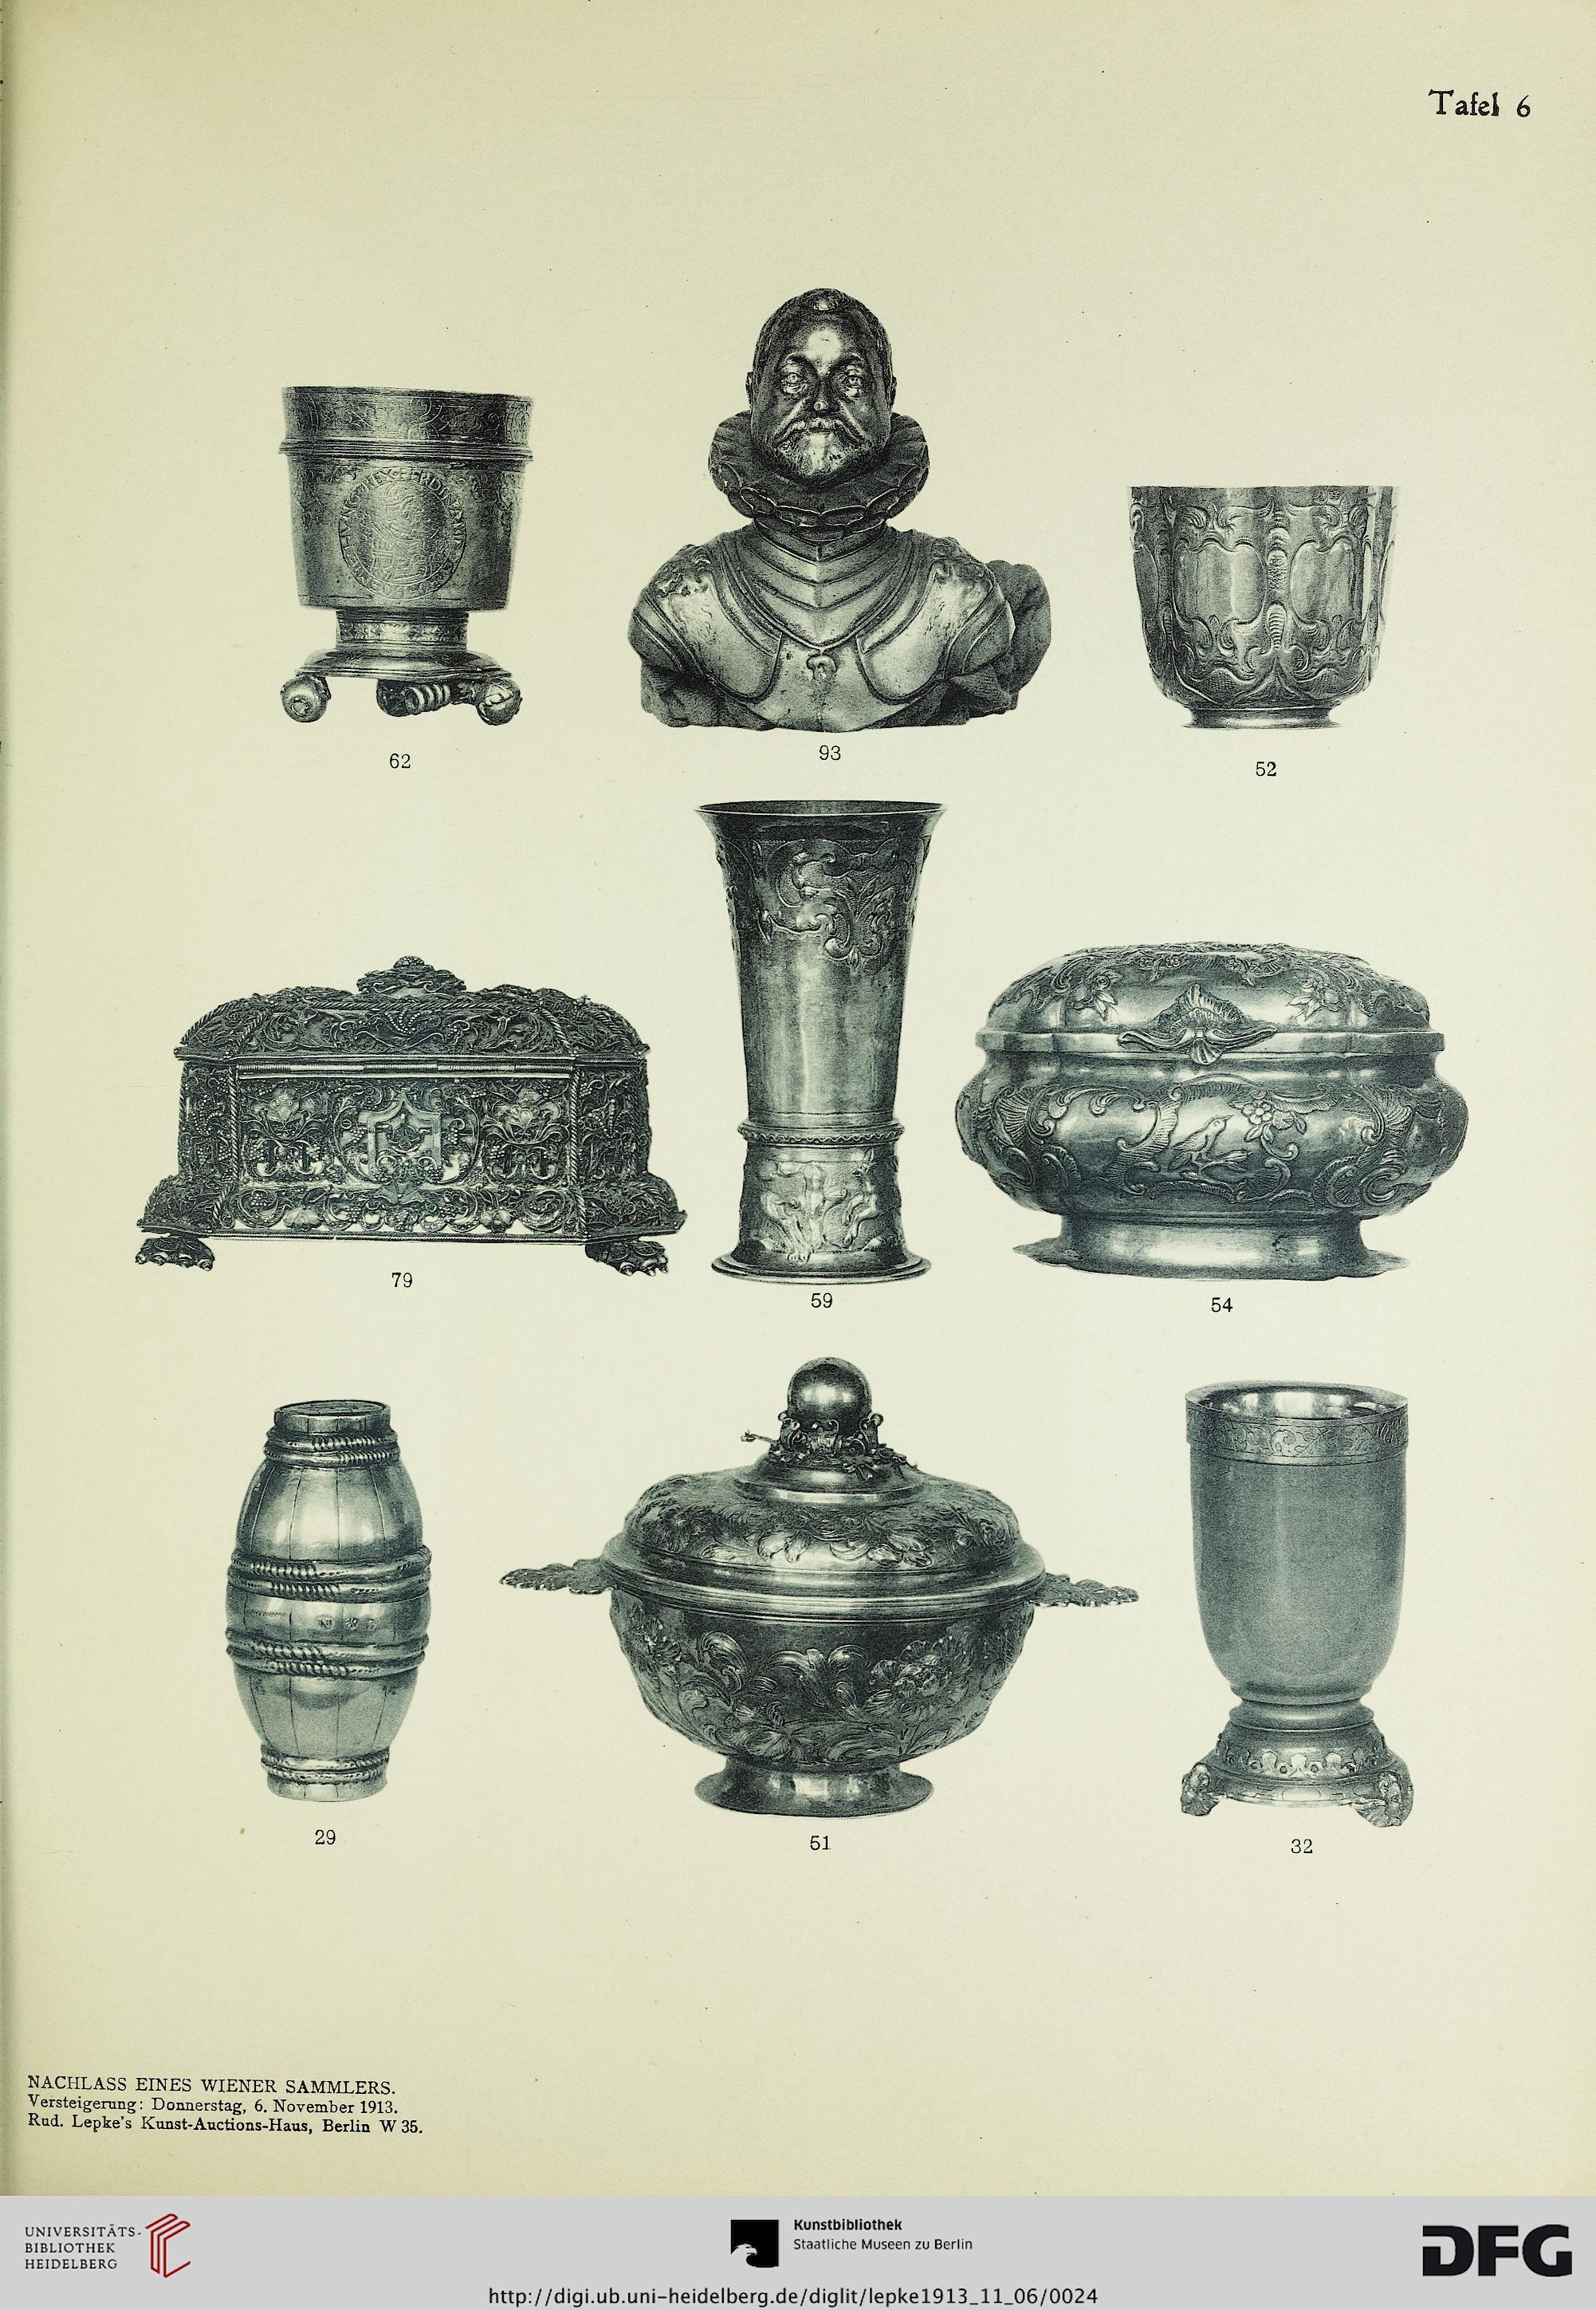 rudolph lepke 39 s kunst auctions haus hrsg silberne. Black Bedroom Furniture Sets. Home Design Ideas